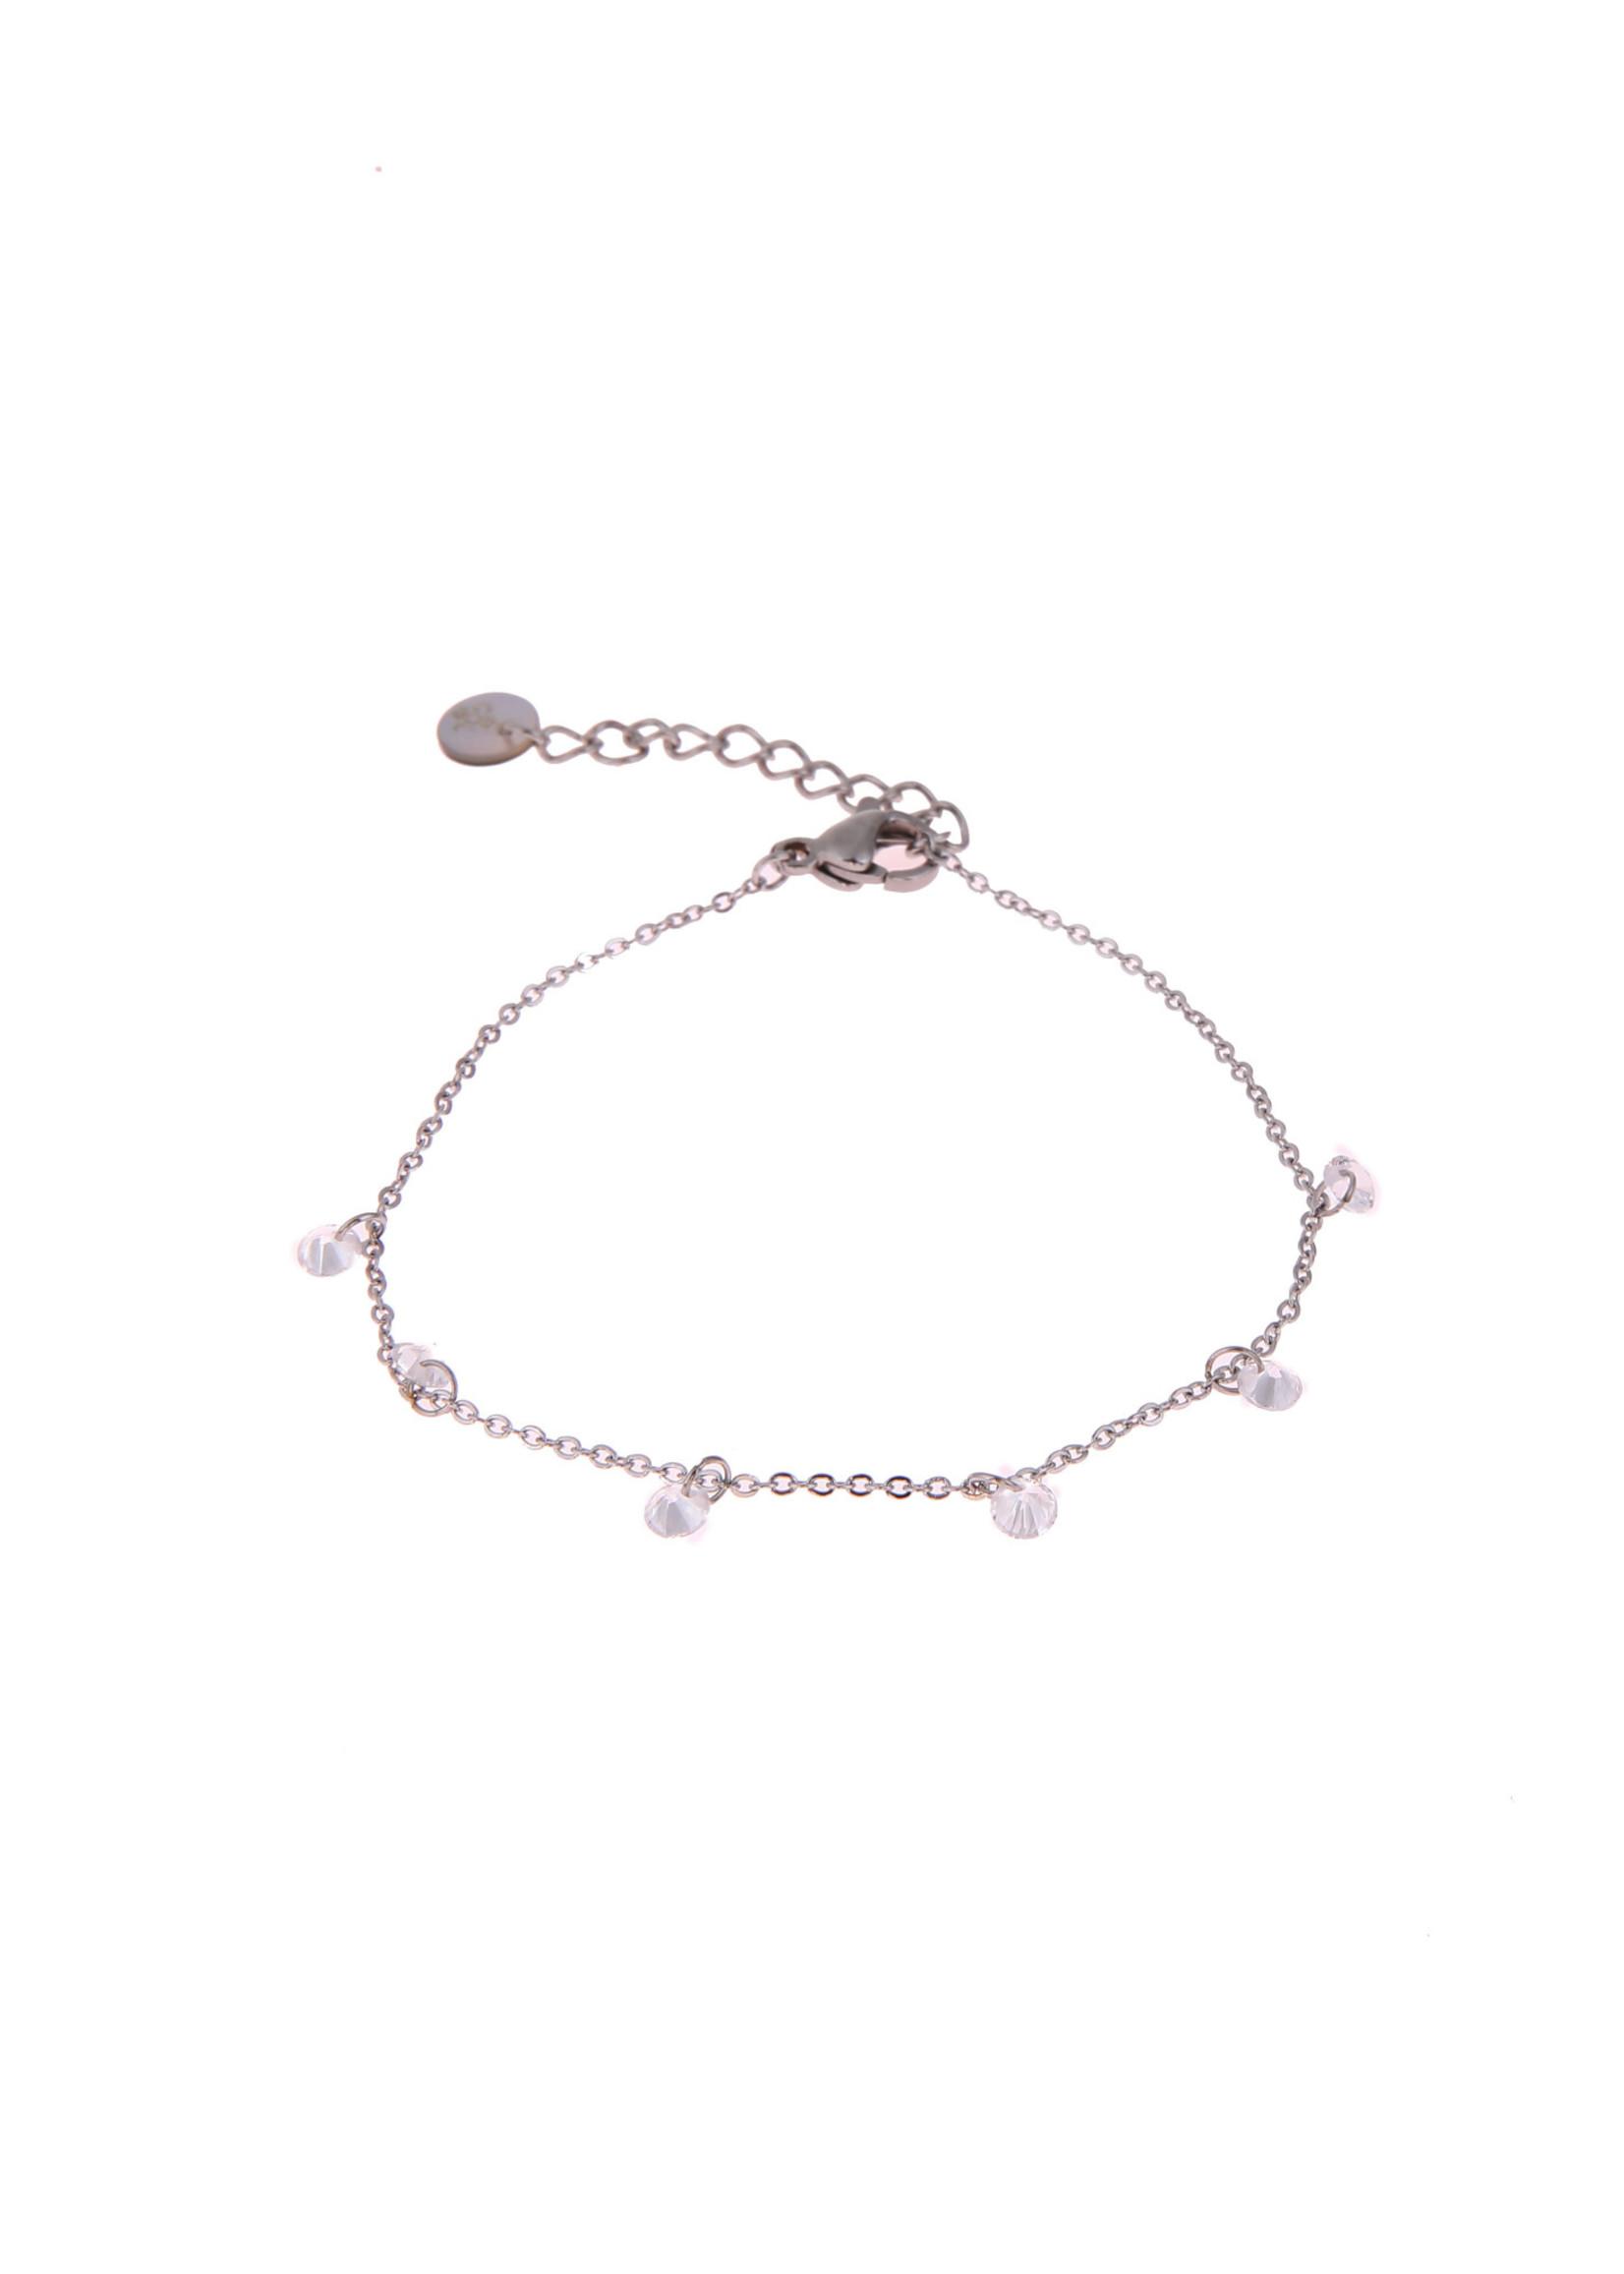 Armband zilver met crystal steentjes B0878-1